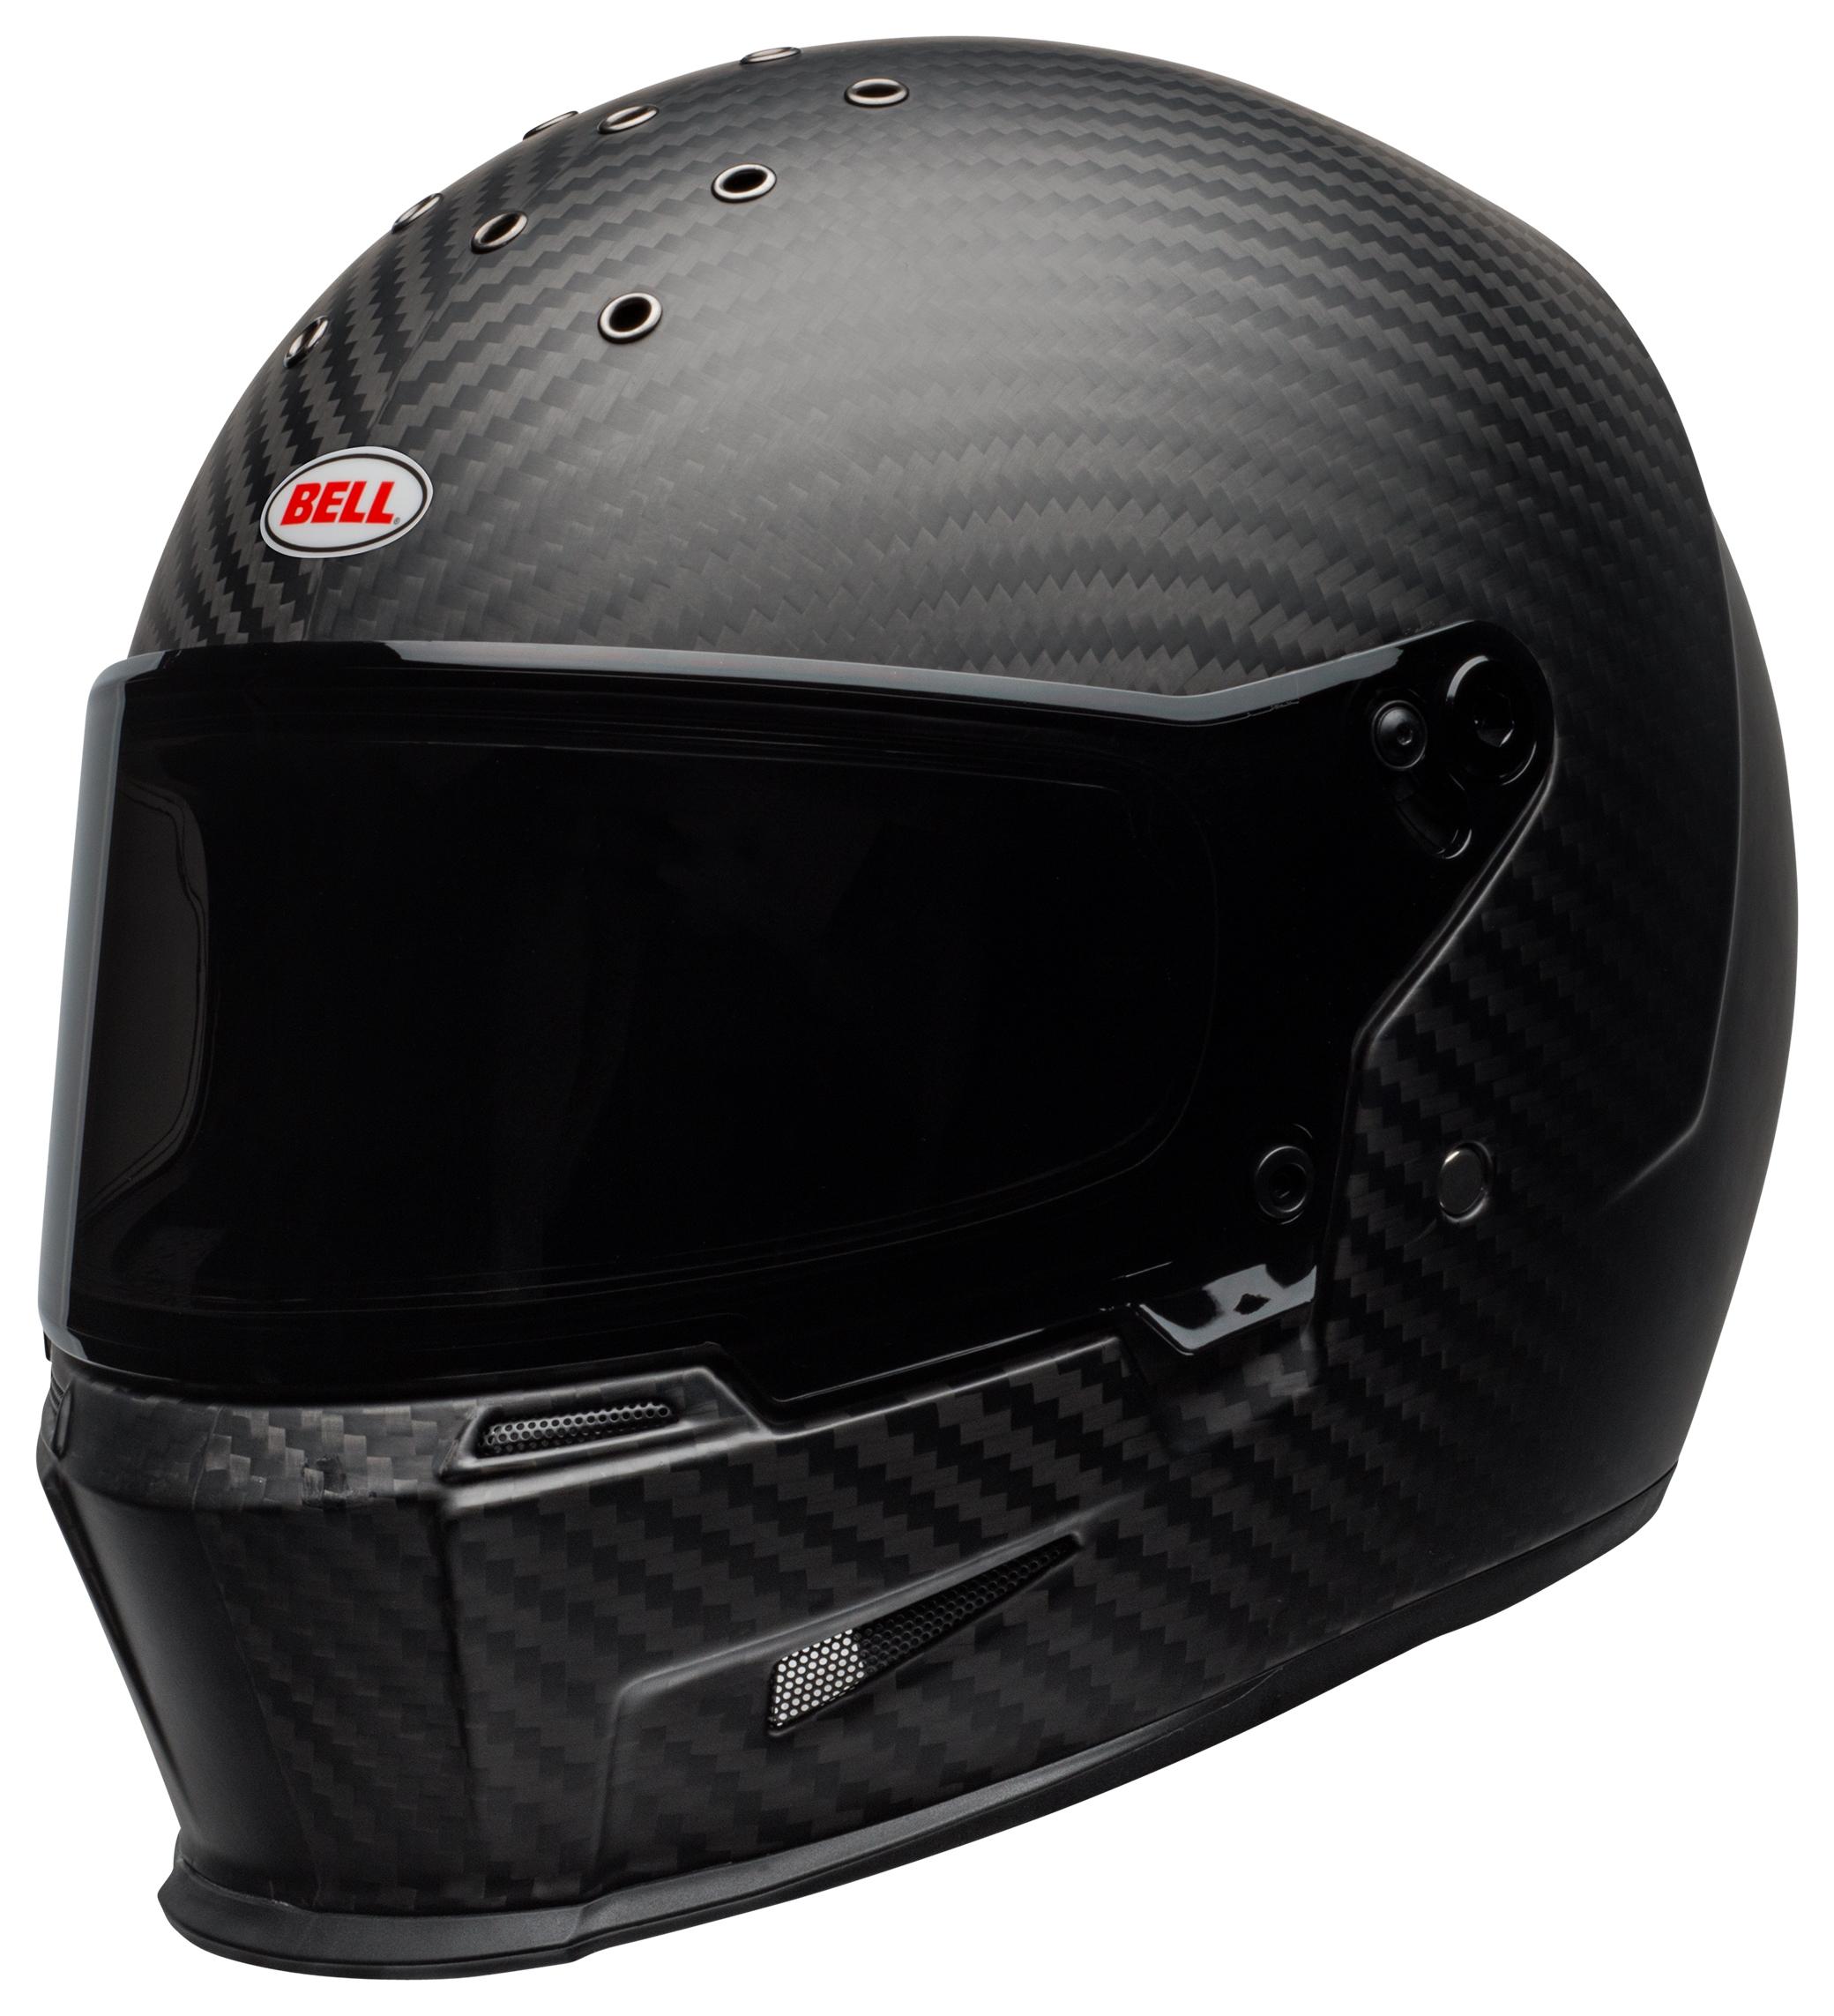 Bell Eliminator Carbon Helmet Cycle Gear